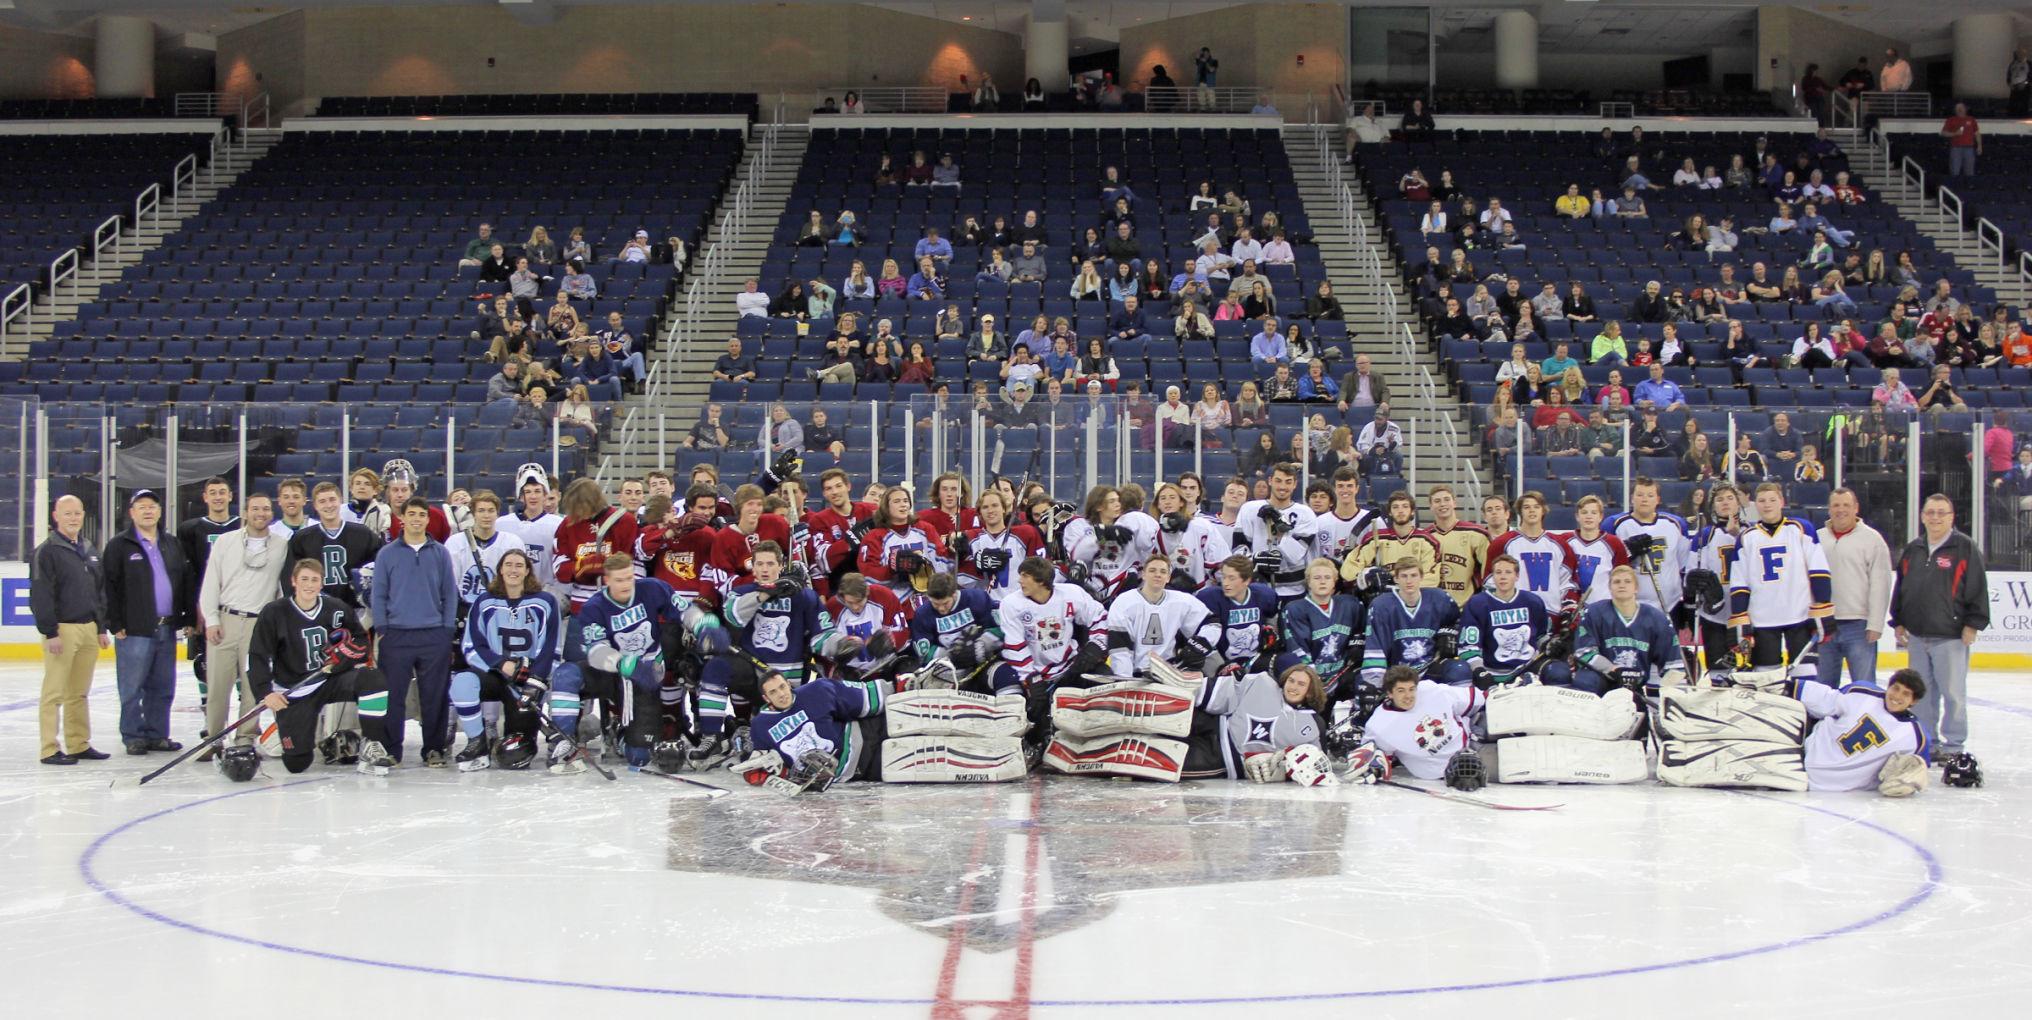 GA H.S.: Georgia High School Hockey League Celebrates 20th Anniversary Season